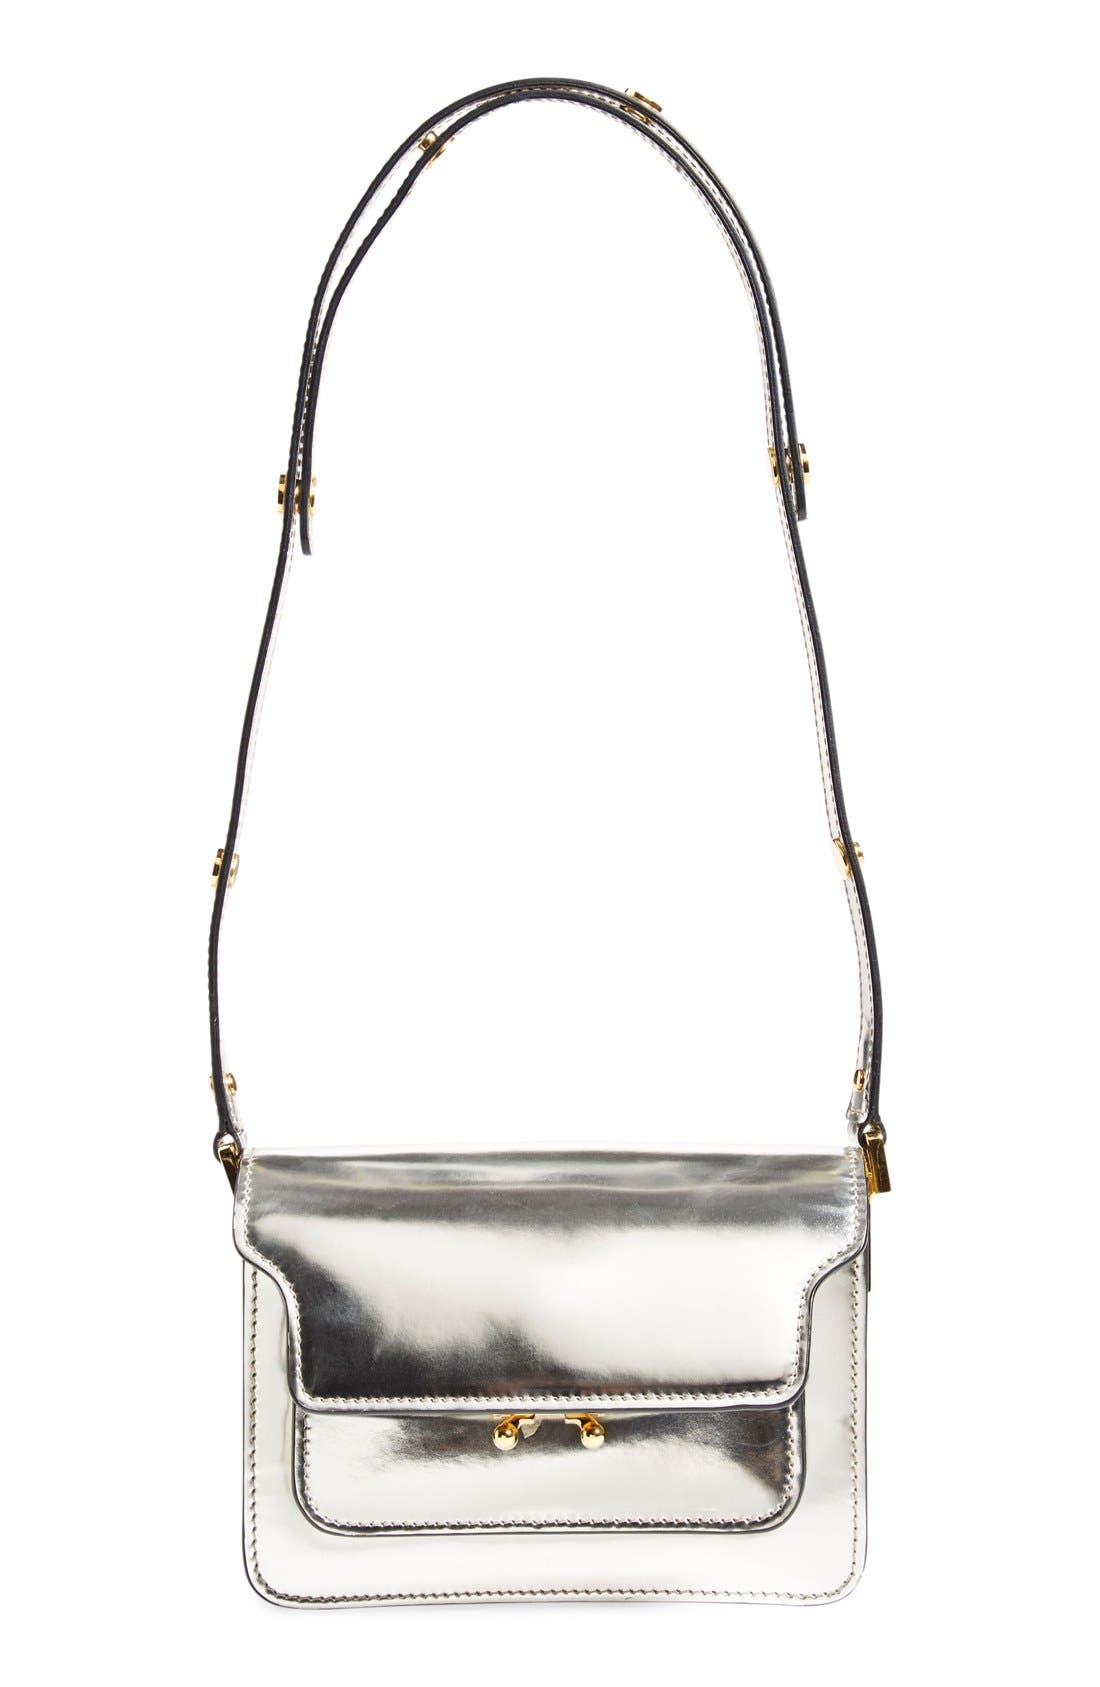 Alternate Image 1 Selected - Marni'Mini Trunk' Metallic LeatherShoulder Bag